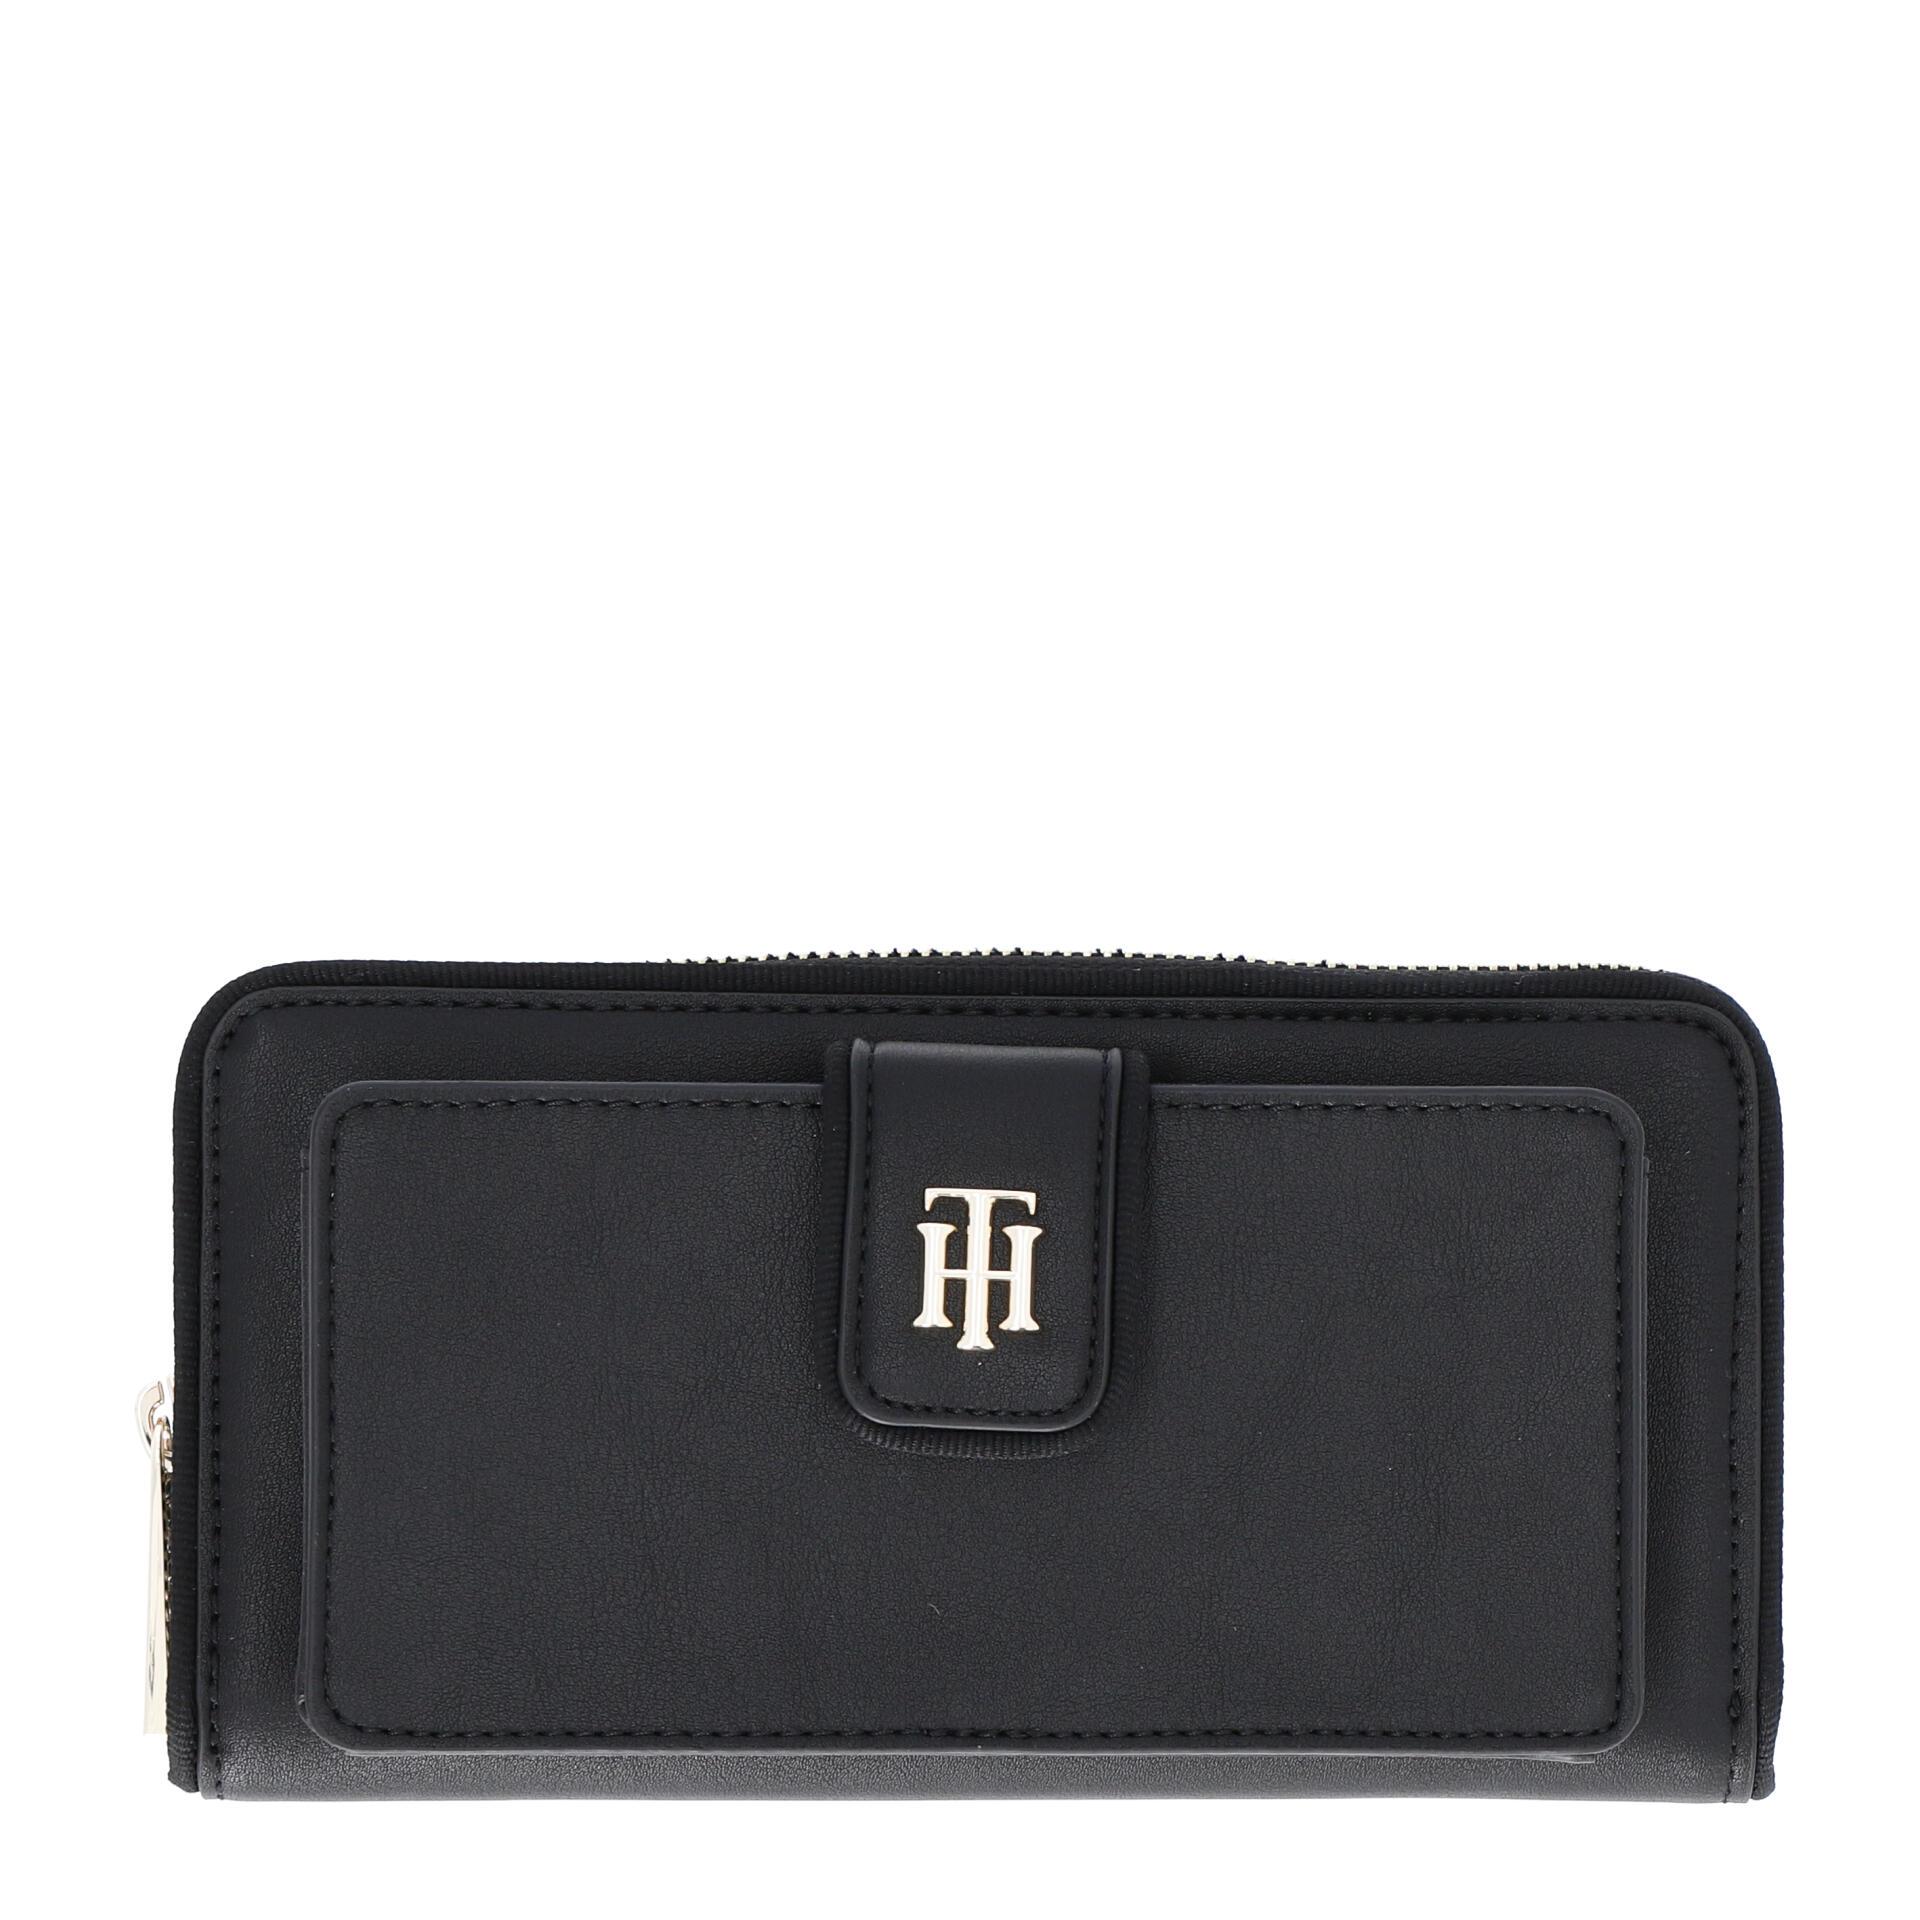 Tommy Hilfiger TH City Large Handy Geldbörse black